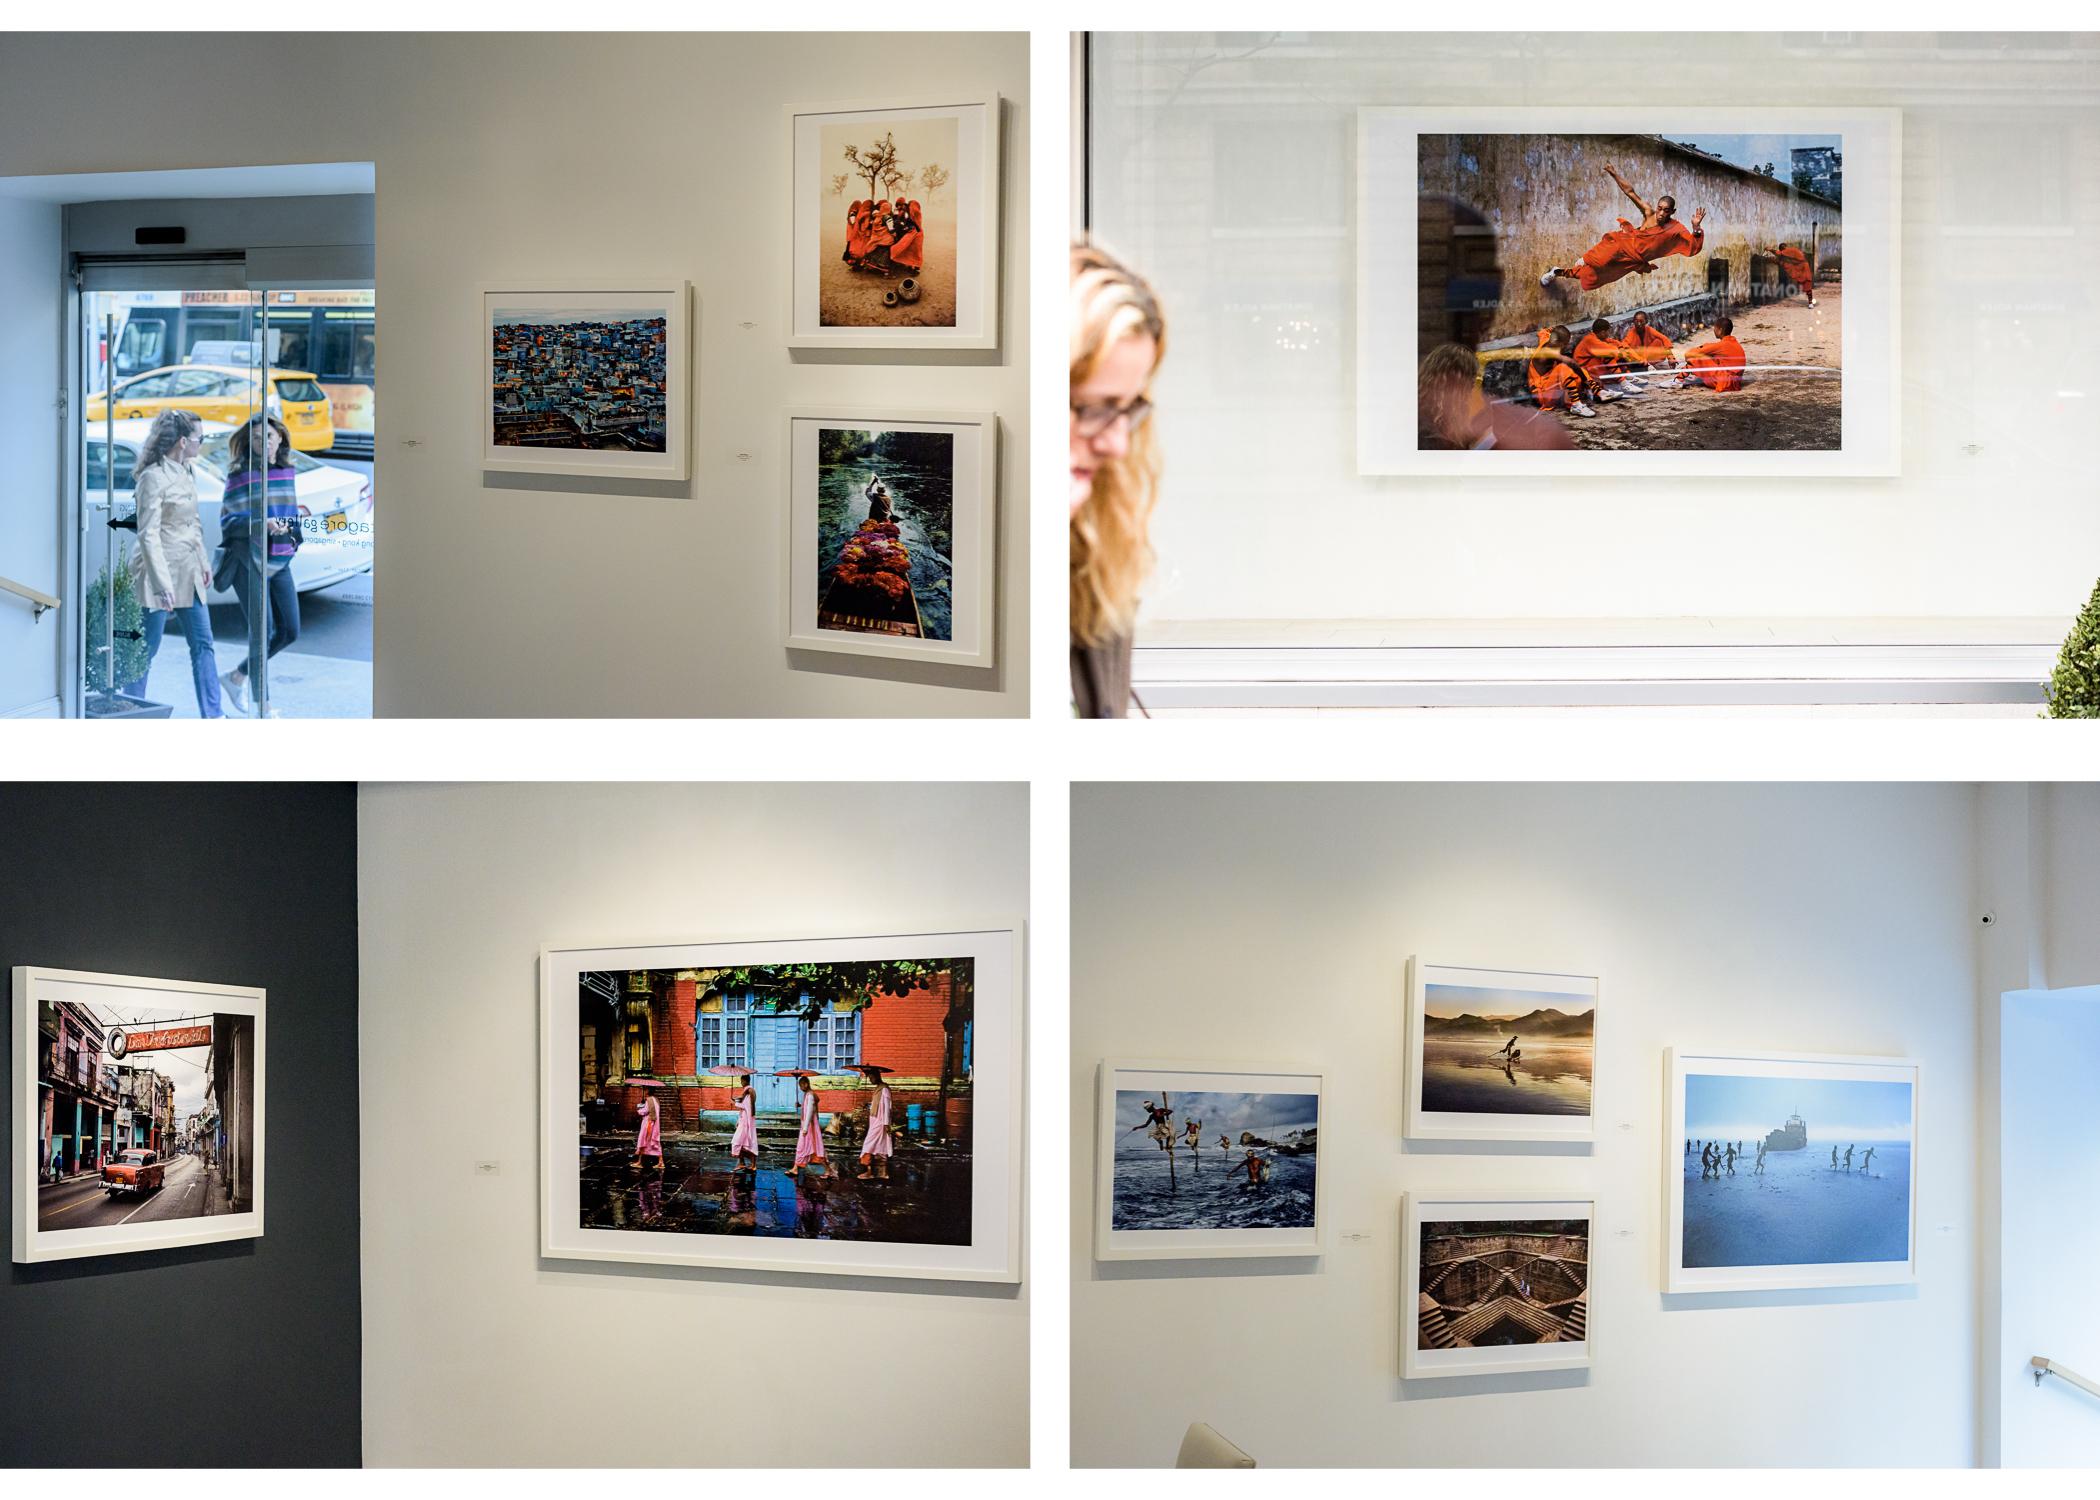 Images above: ©Fernando Sandoval, Opening Night